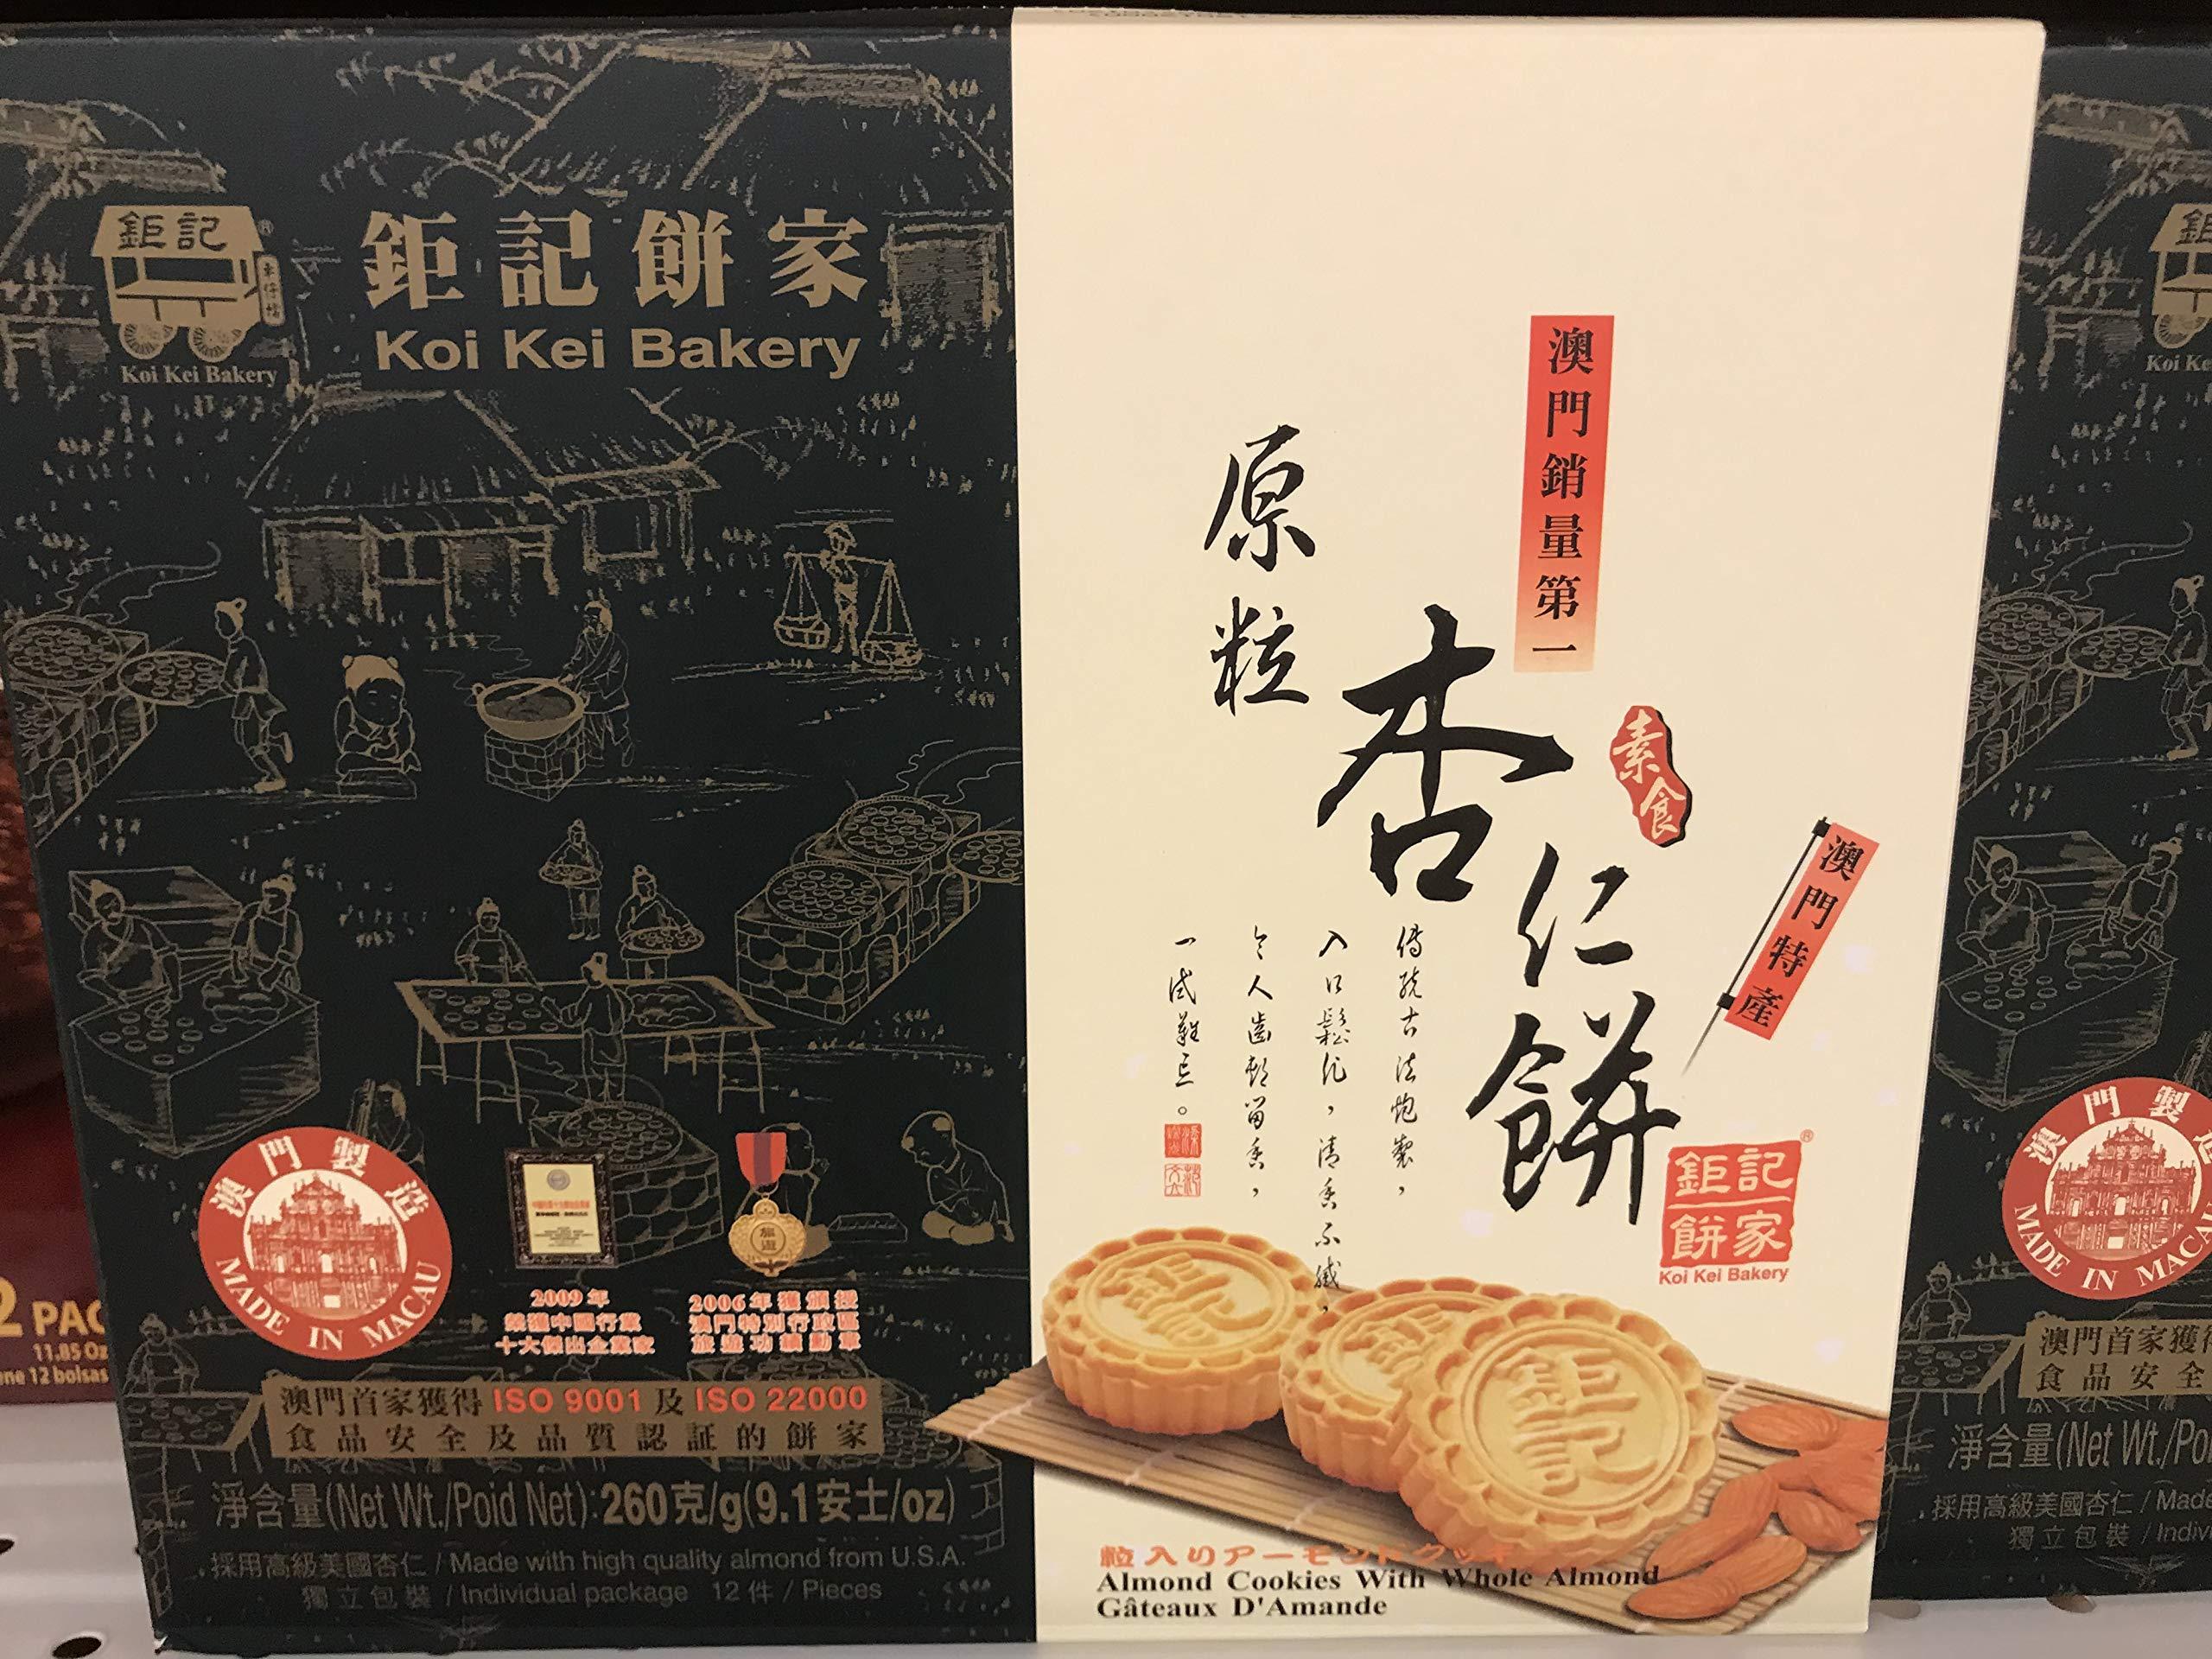 Koi Kei Bakery Almond cookies w/Whole Almonds 260g - Product of Macau